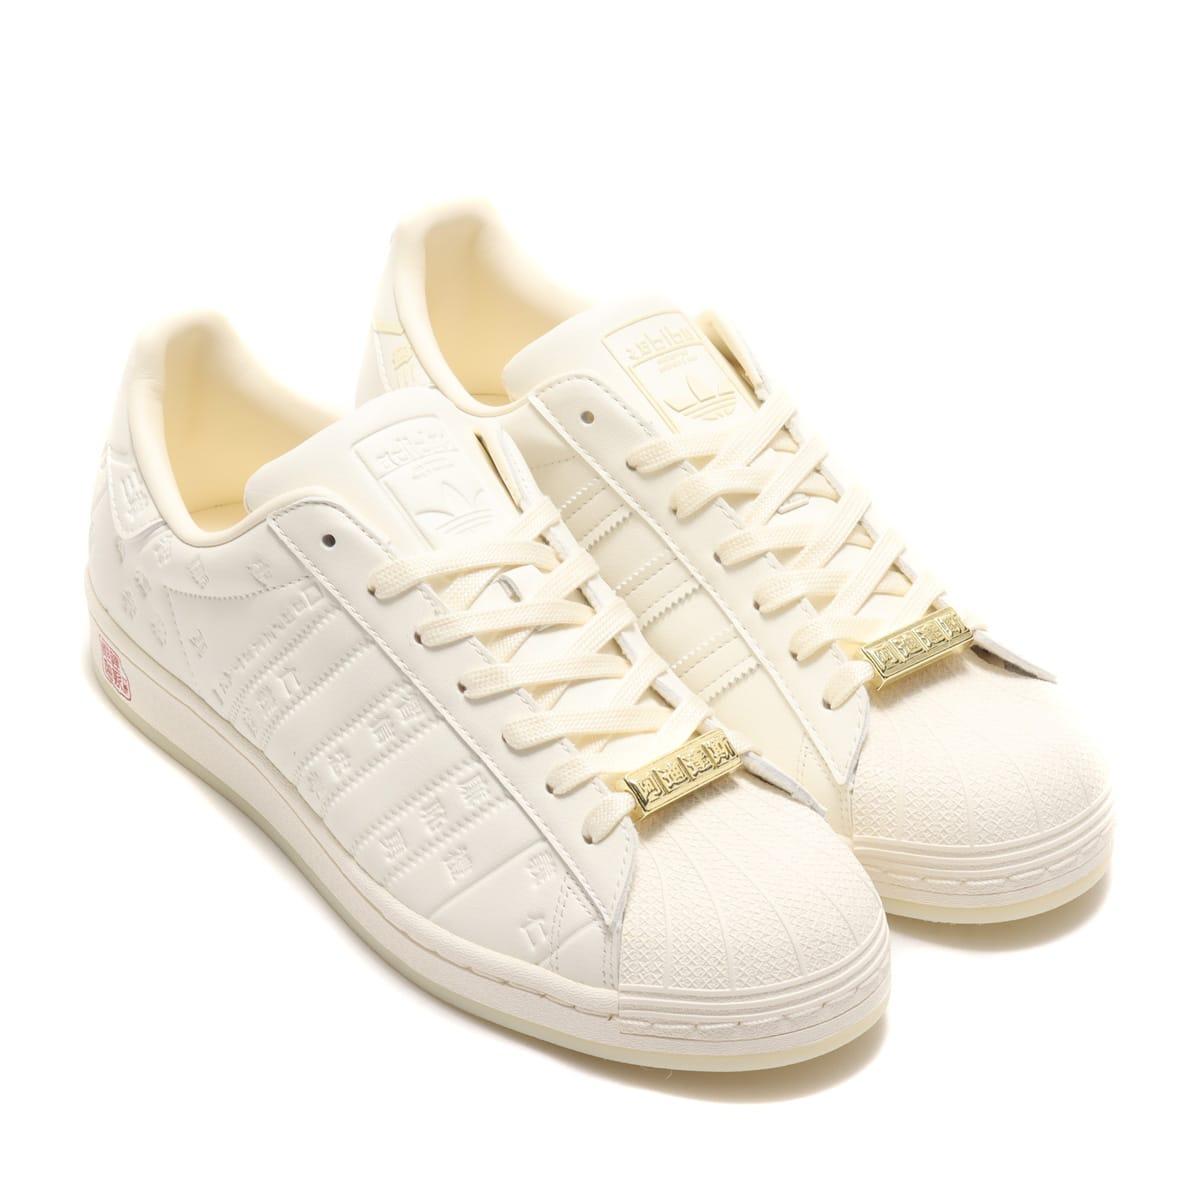 adidas SST CREAM WHITE/CREAM WHITE/GOLD METALLIC 21SS-S_photo_large